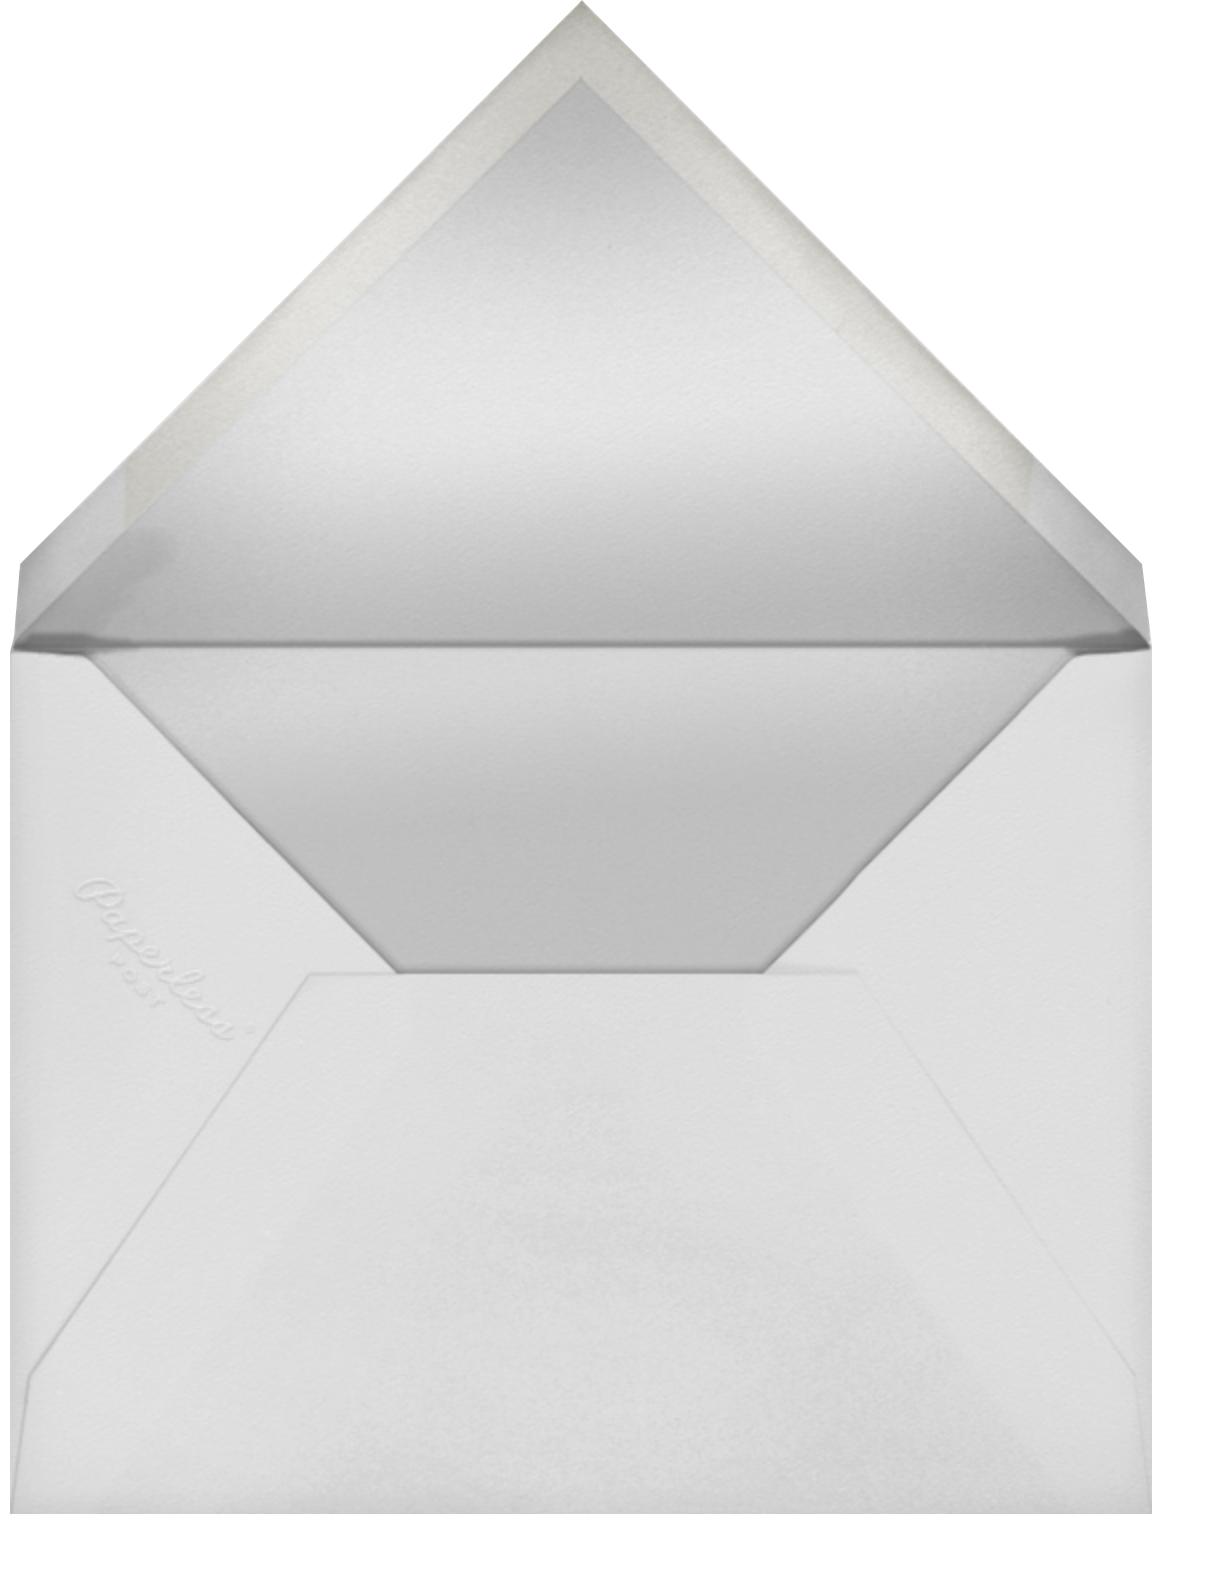 Belvoir (Menu) - Purple/White - Paperless Post - Envelope